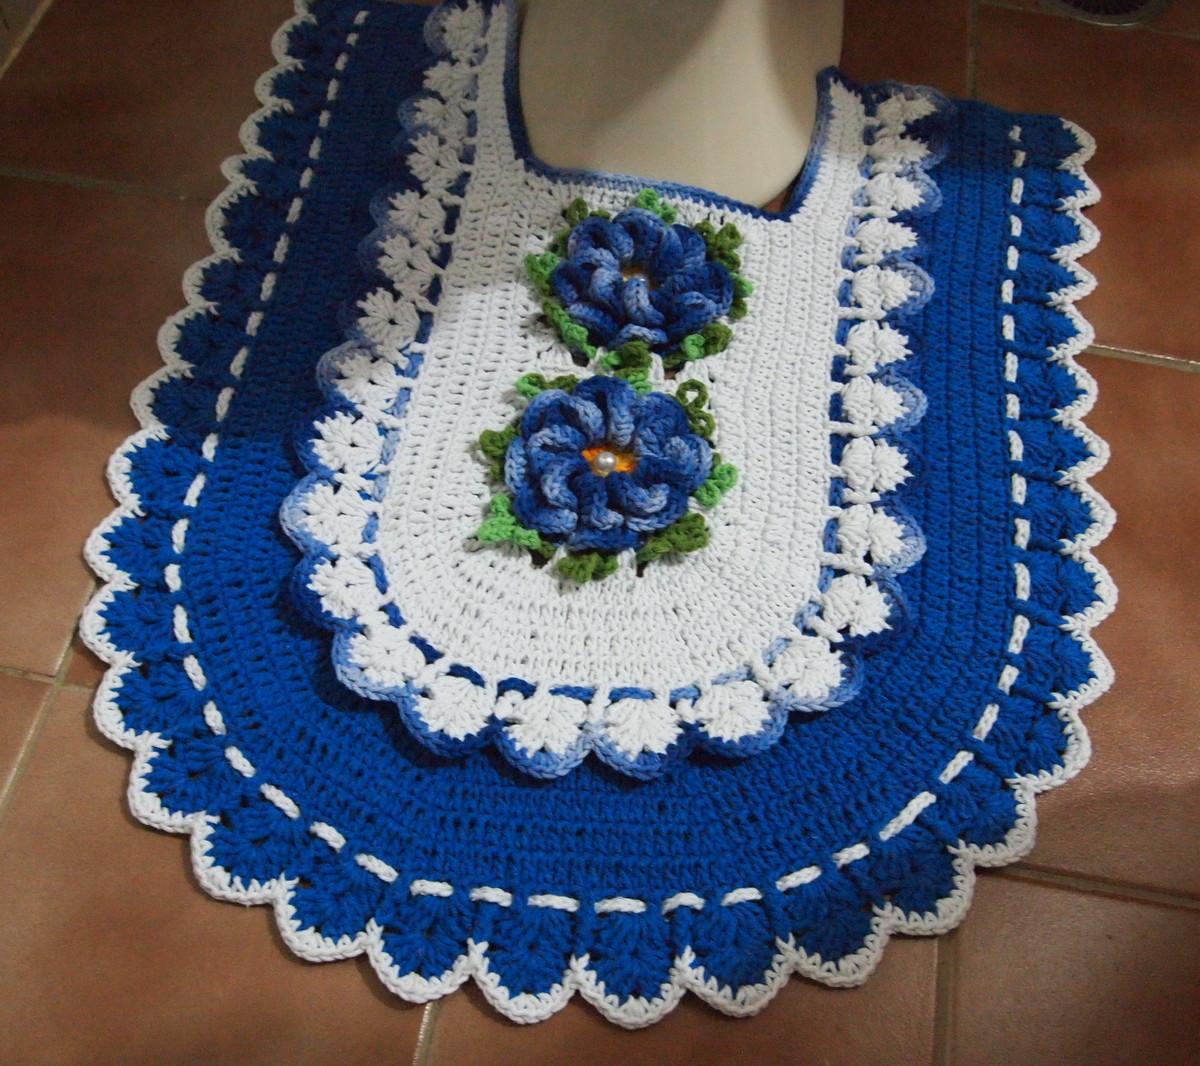 Jogo banheiro azul croche : Jogo de banheiro branco azul?o croches da elsa elo